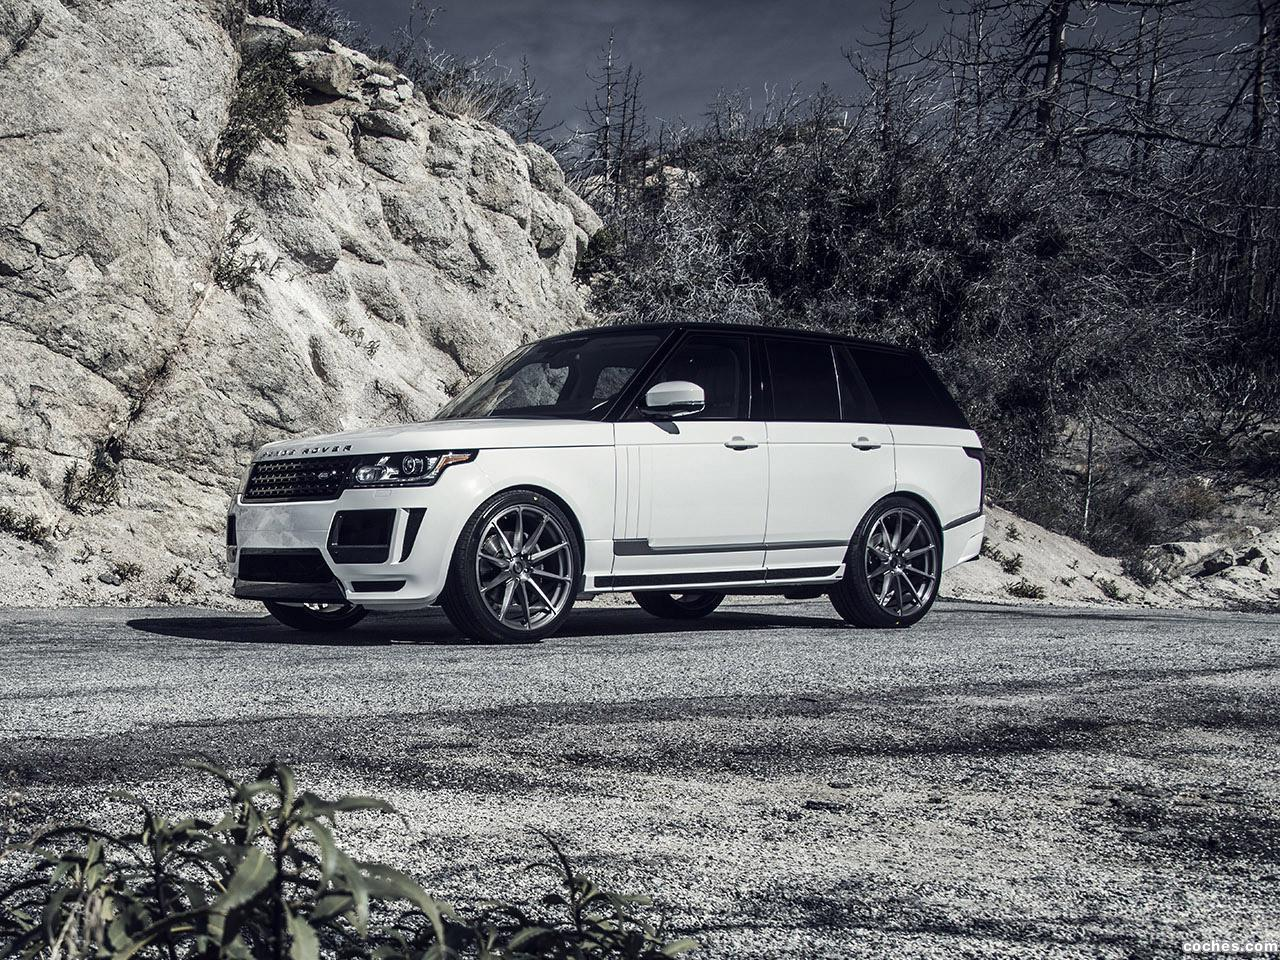 Foto 5 de Vorsteiner Land Rover Range Rover Veritas 2014